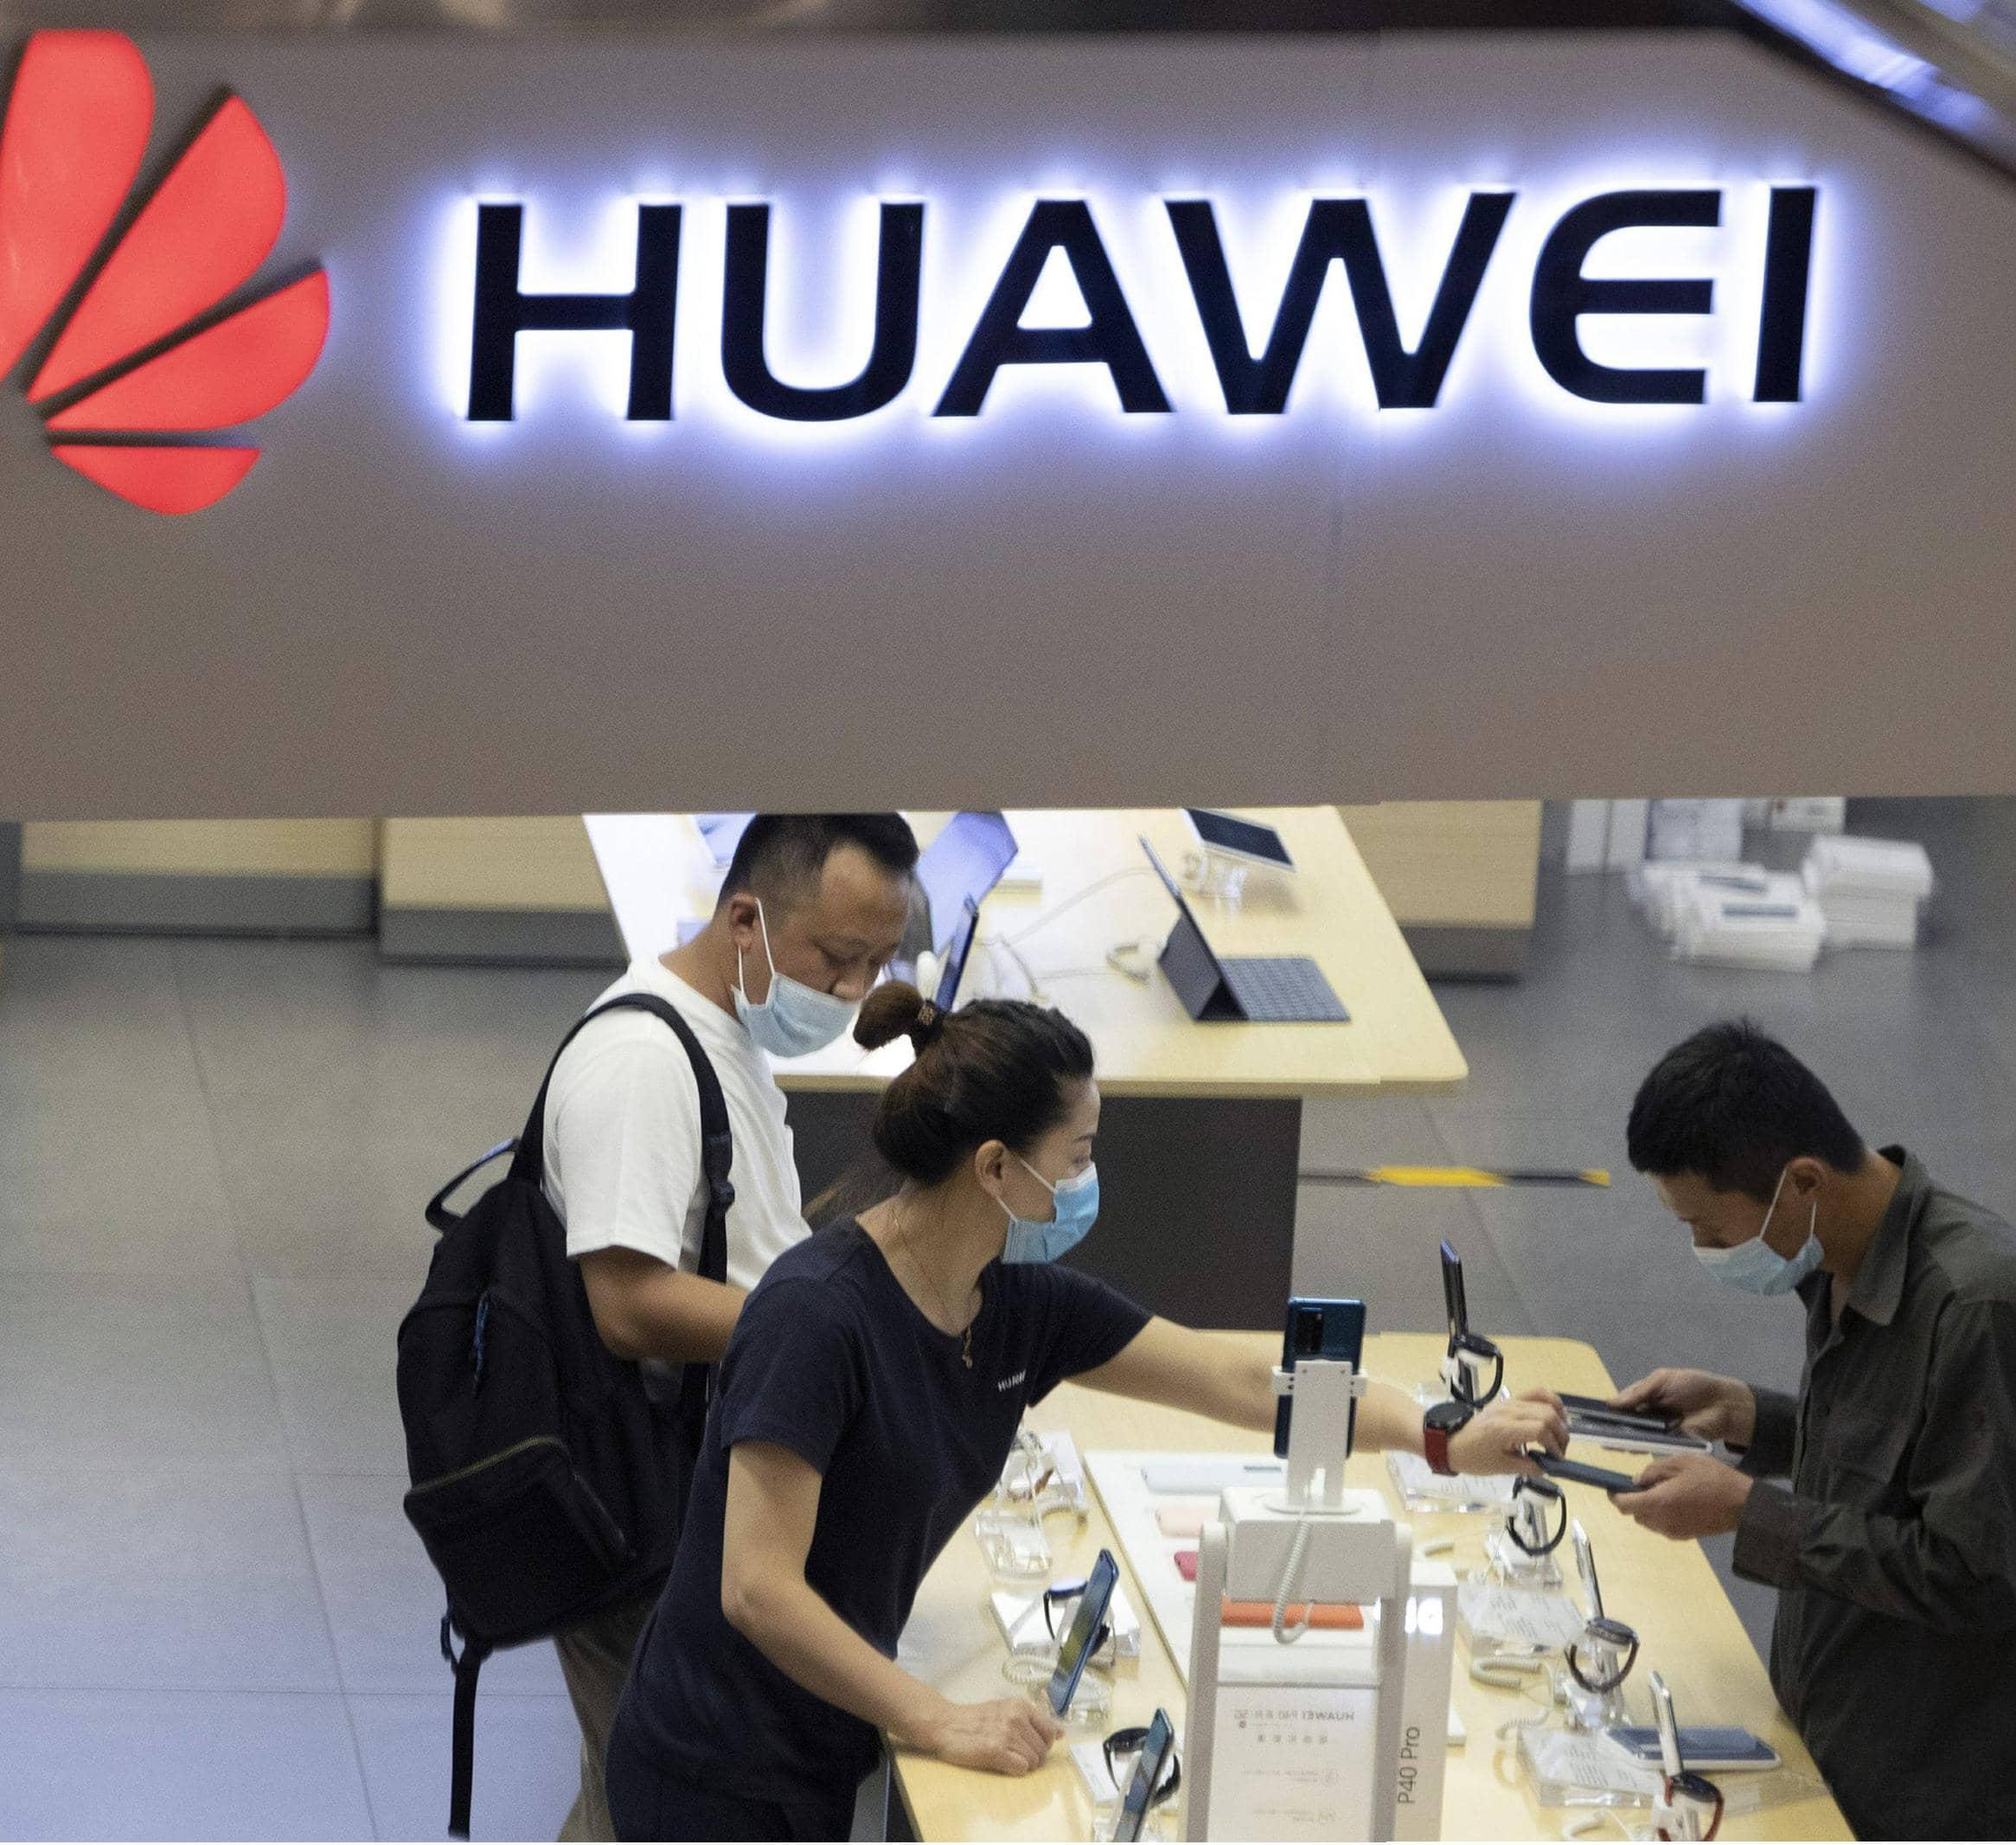 HUAWEI OVERTAKES SAMSUNG AS TOP SMARTPHONE SELLER: REPORT